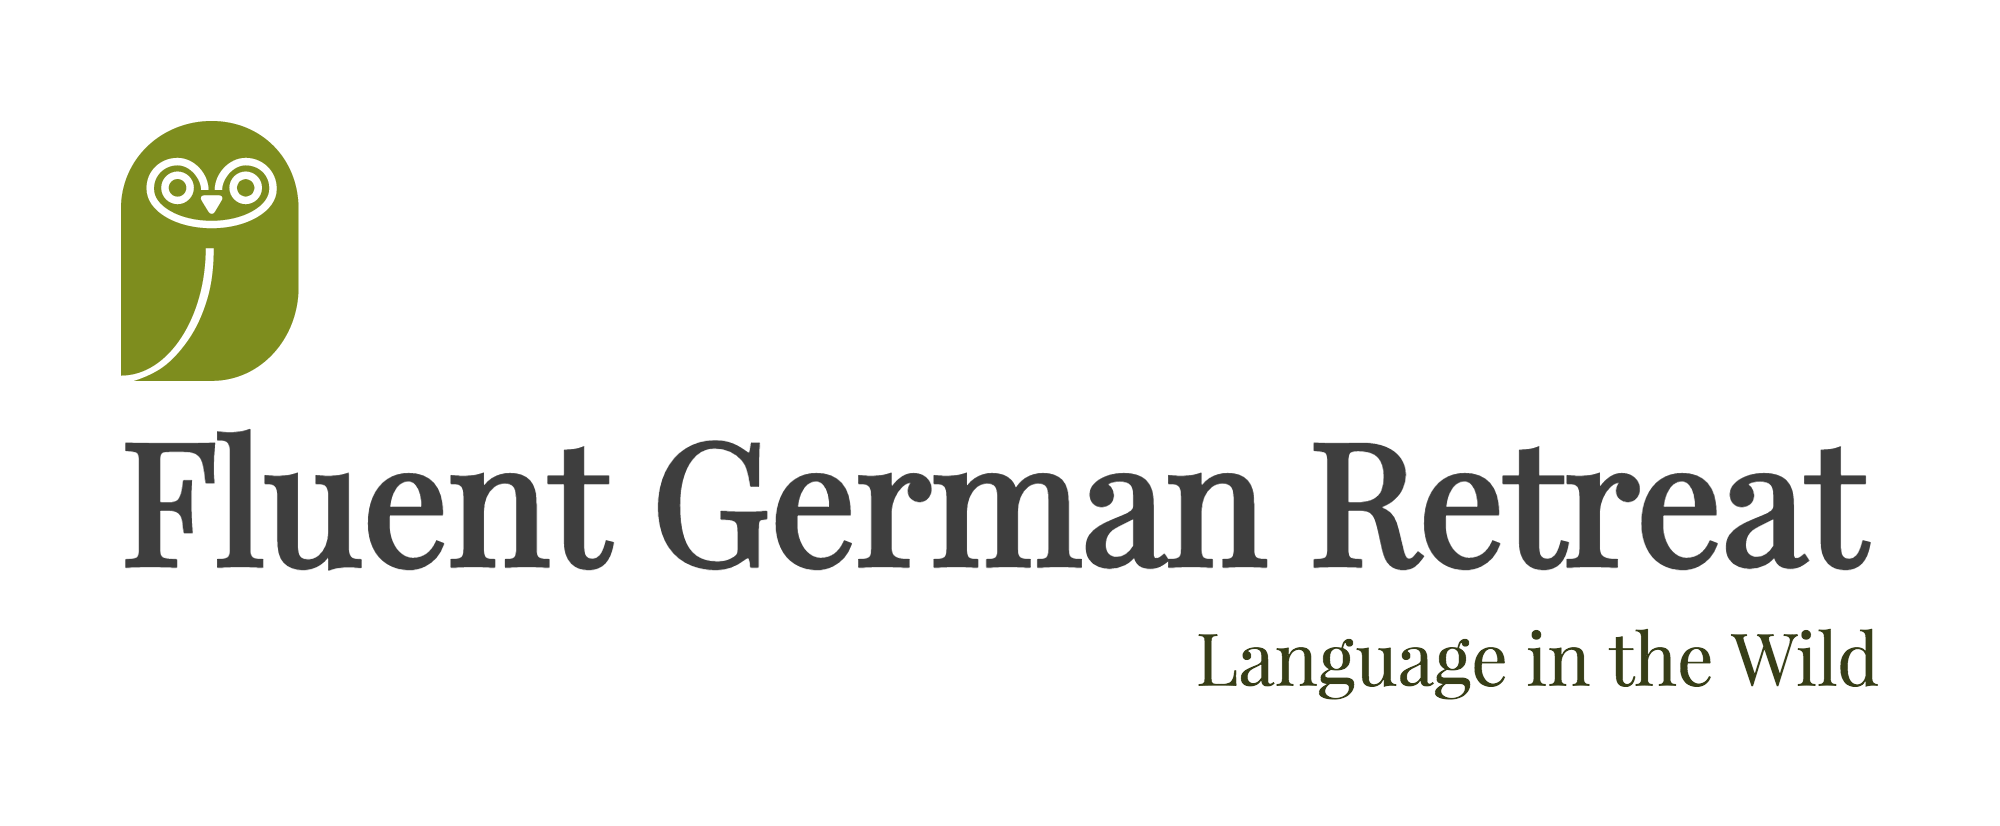 Fluent German Retreat-logo (1).png